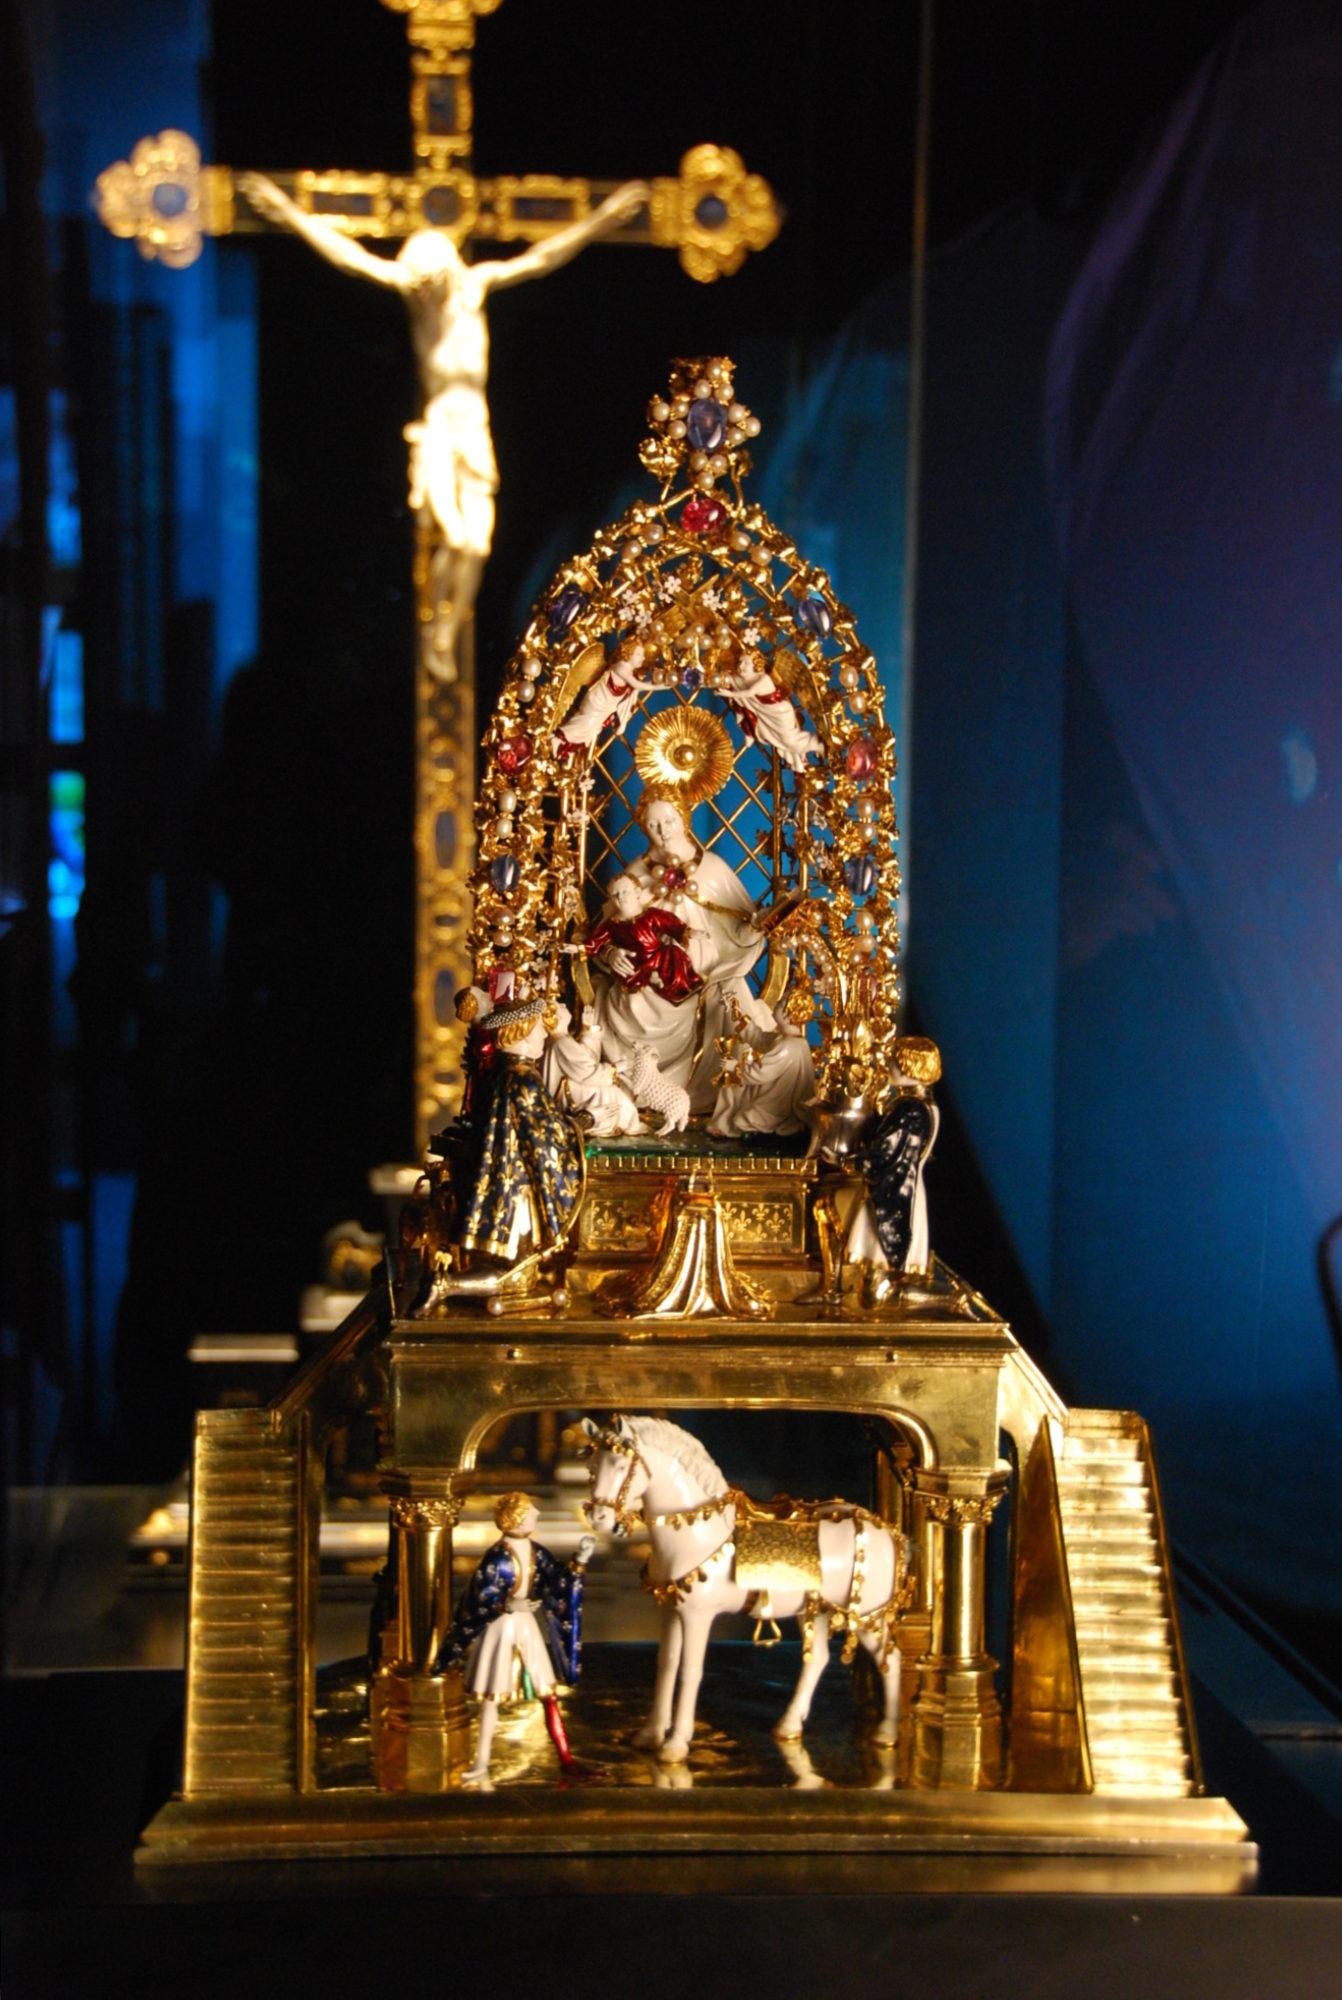 Goldenes Rößl in Neuer Schatzkammer Haus Benedikt XVI AÖ 8 5 09